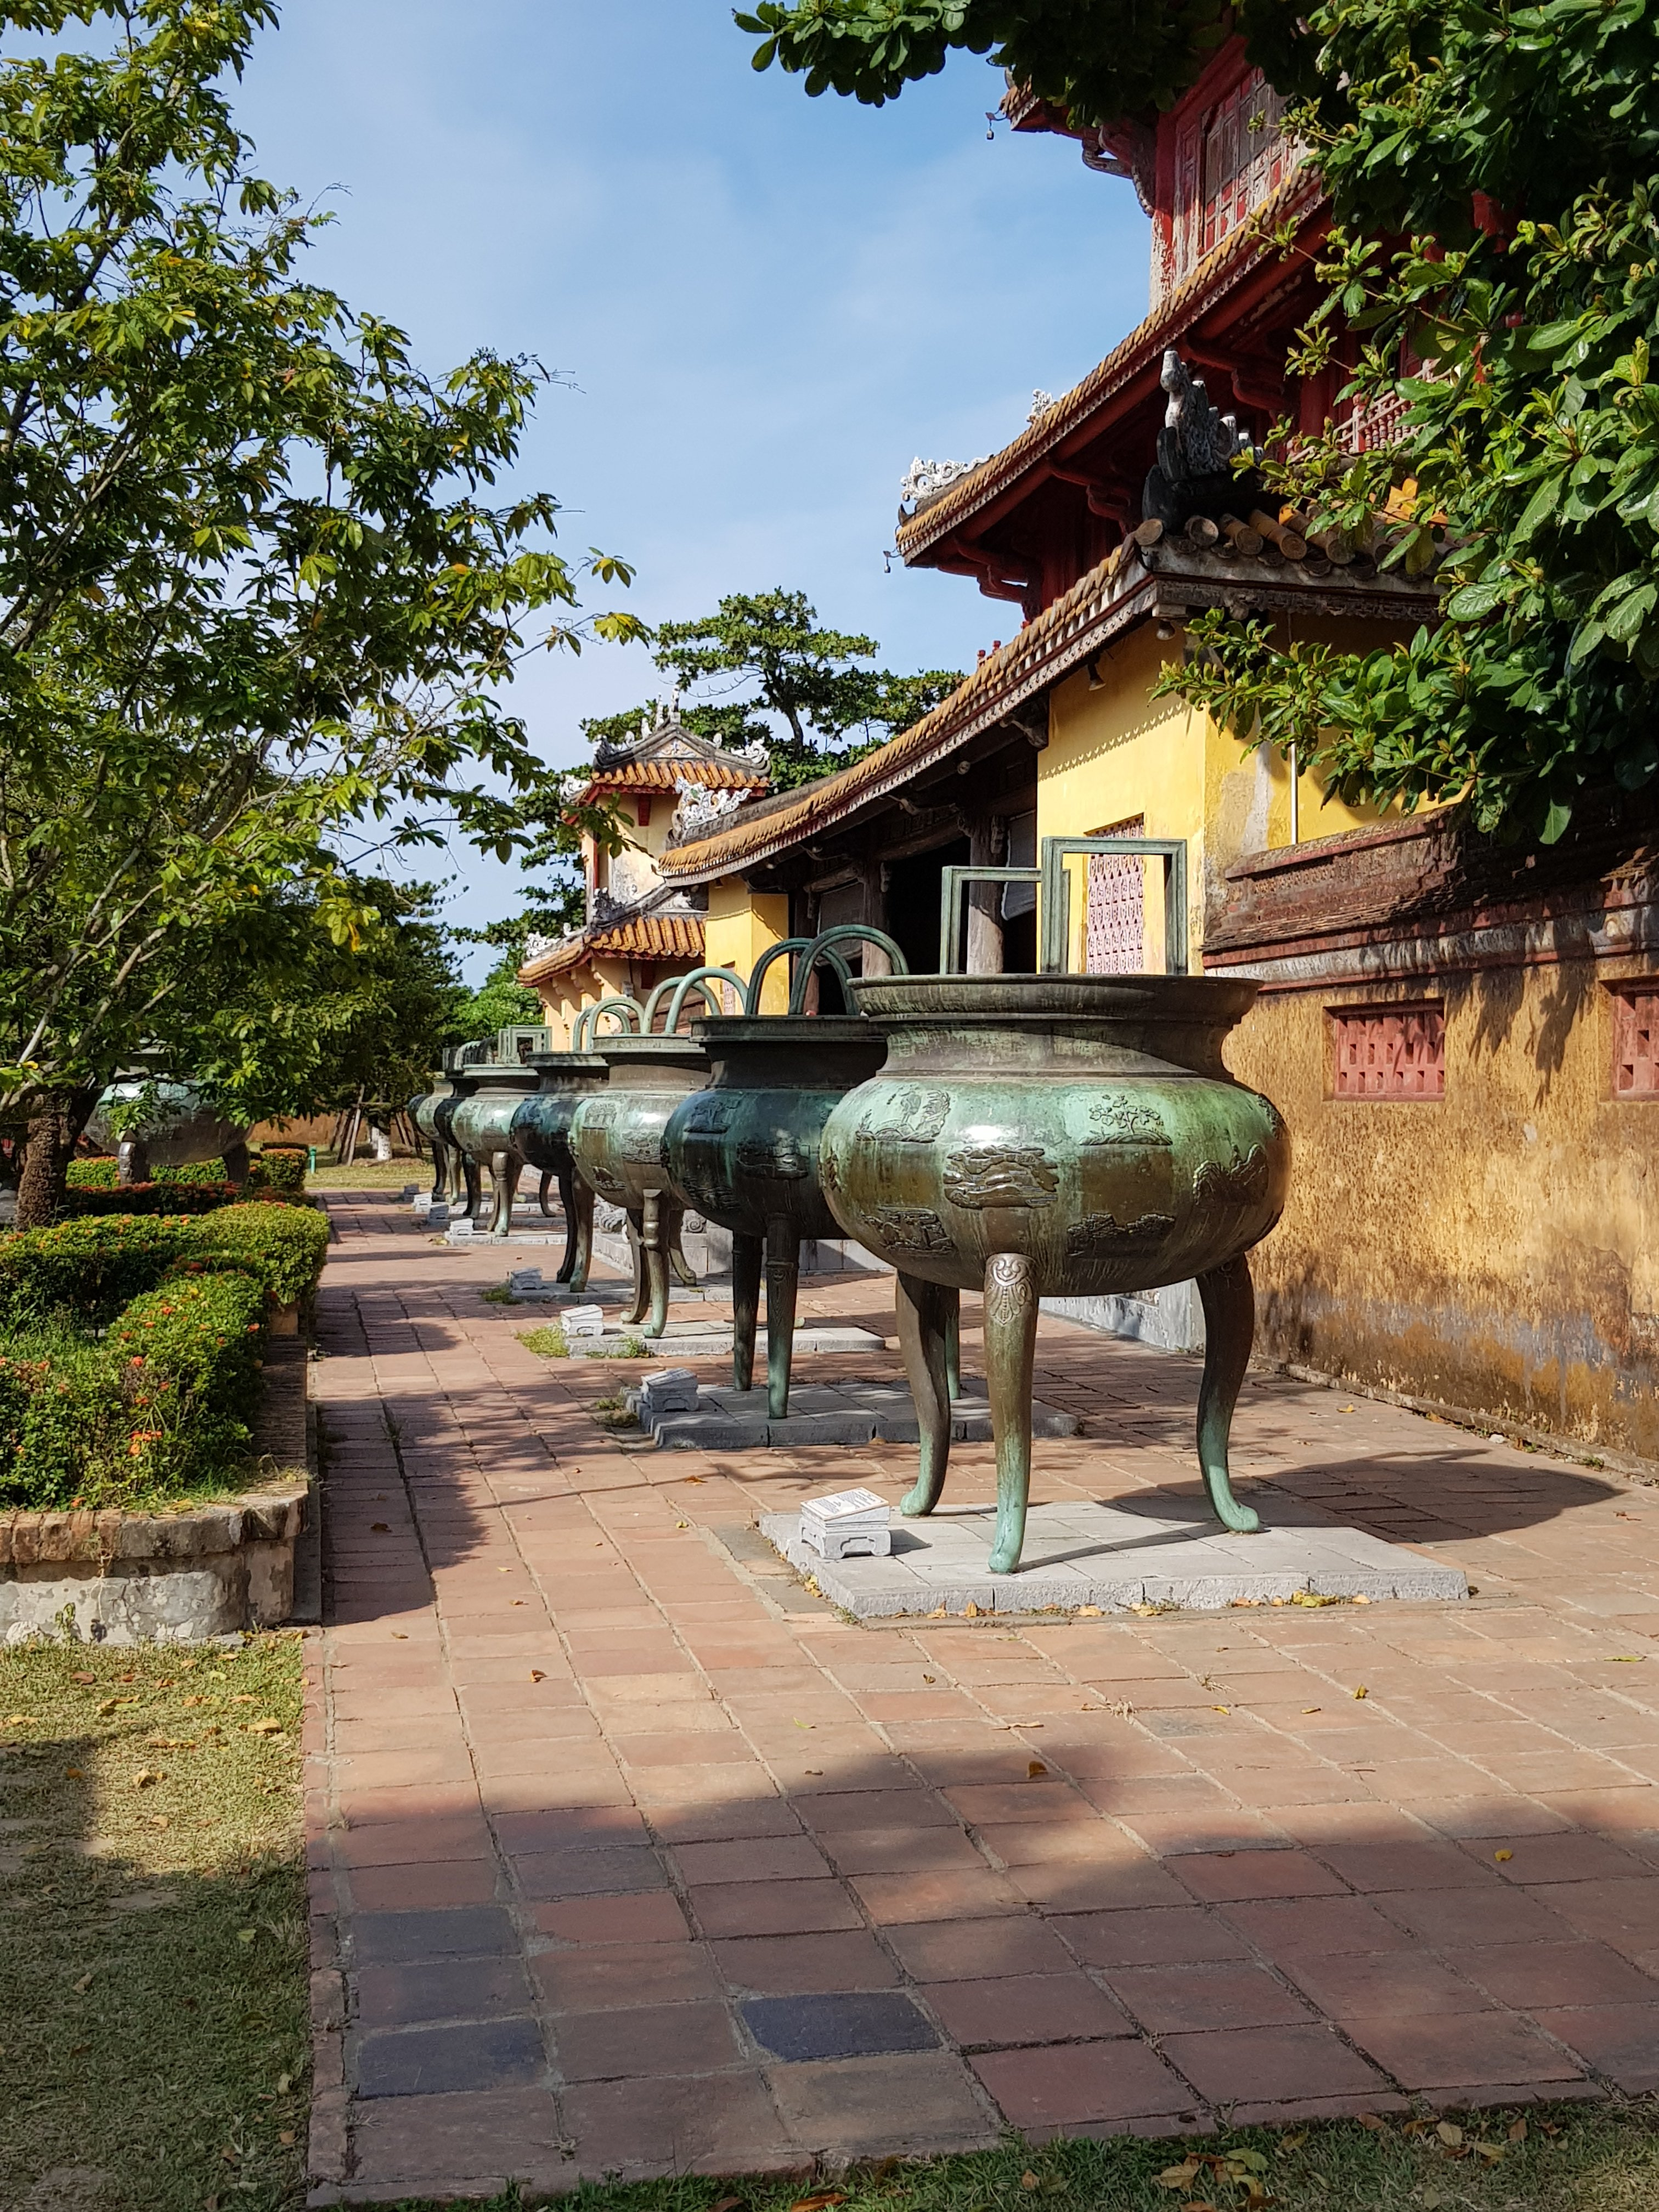 Hue to Da Nang: Dynastic Urns in Hue